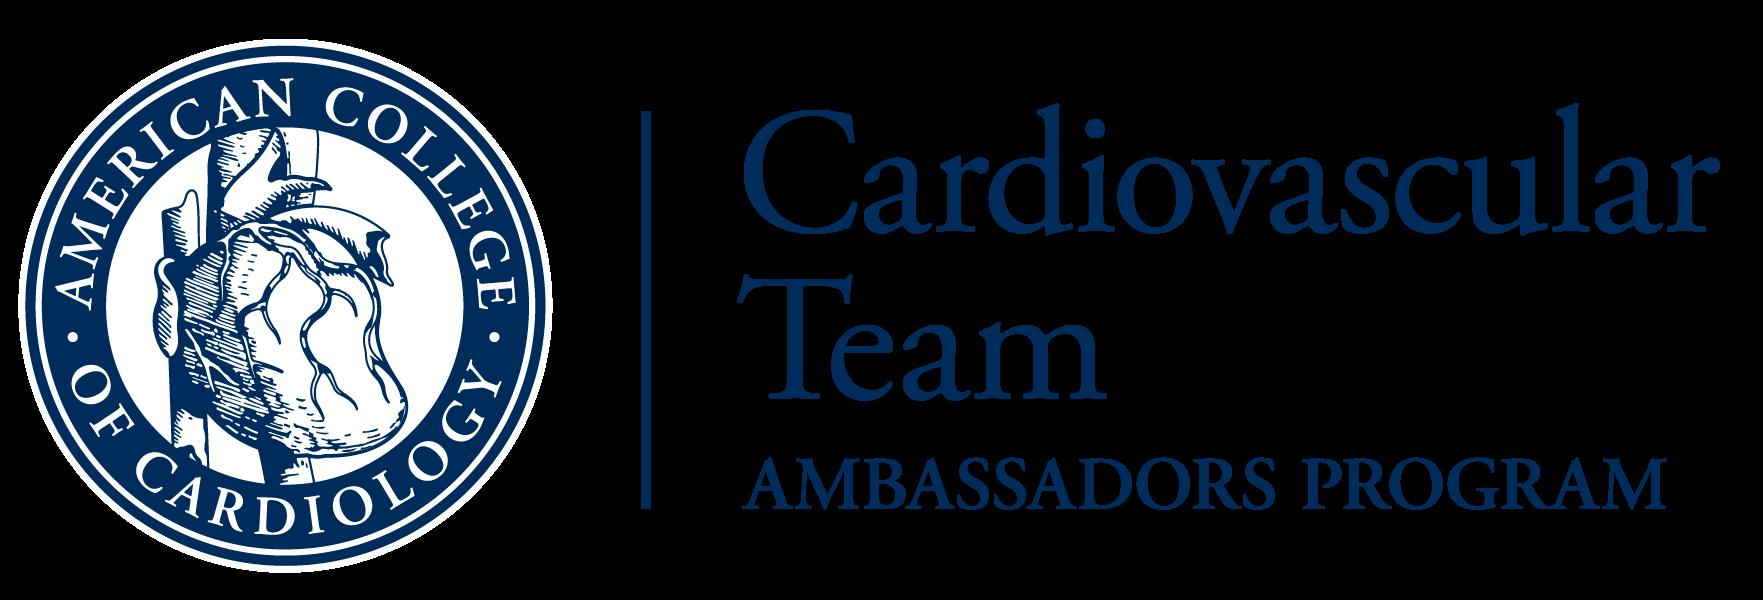 CV Team Ambassadors Program